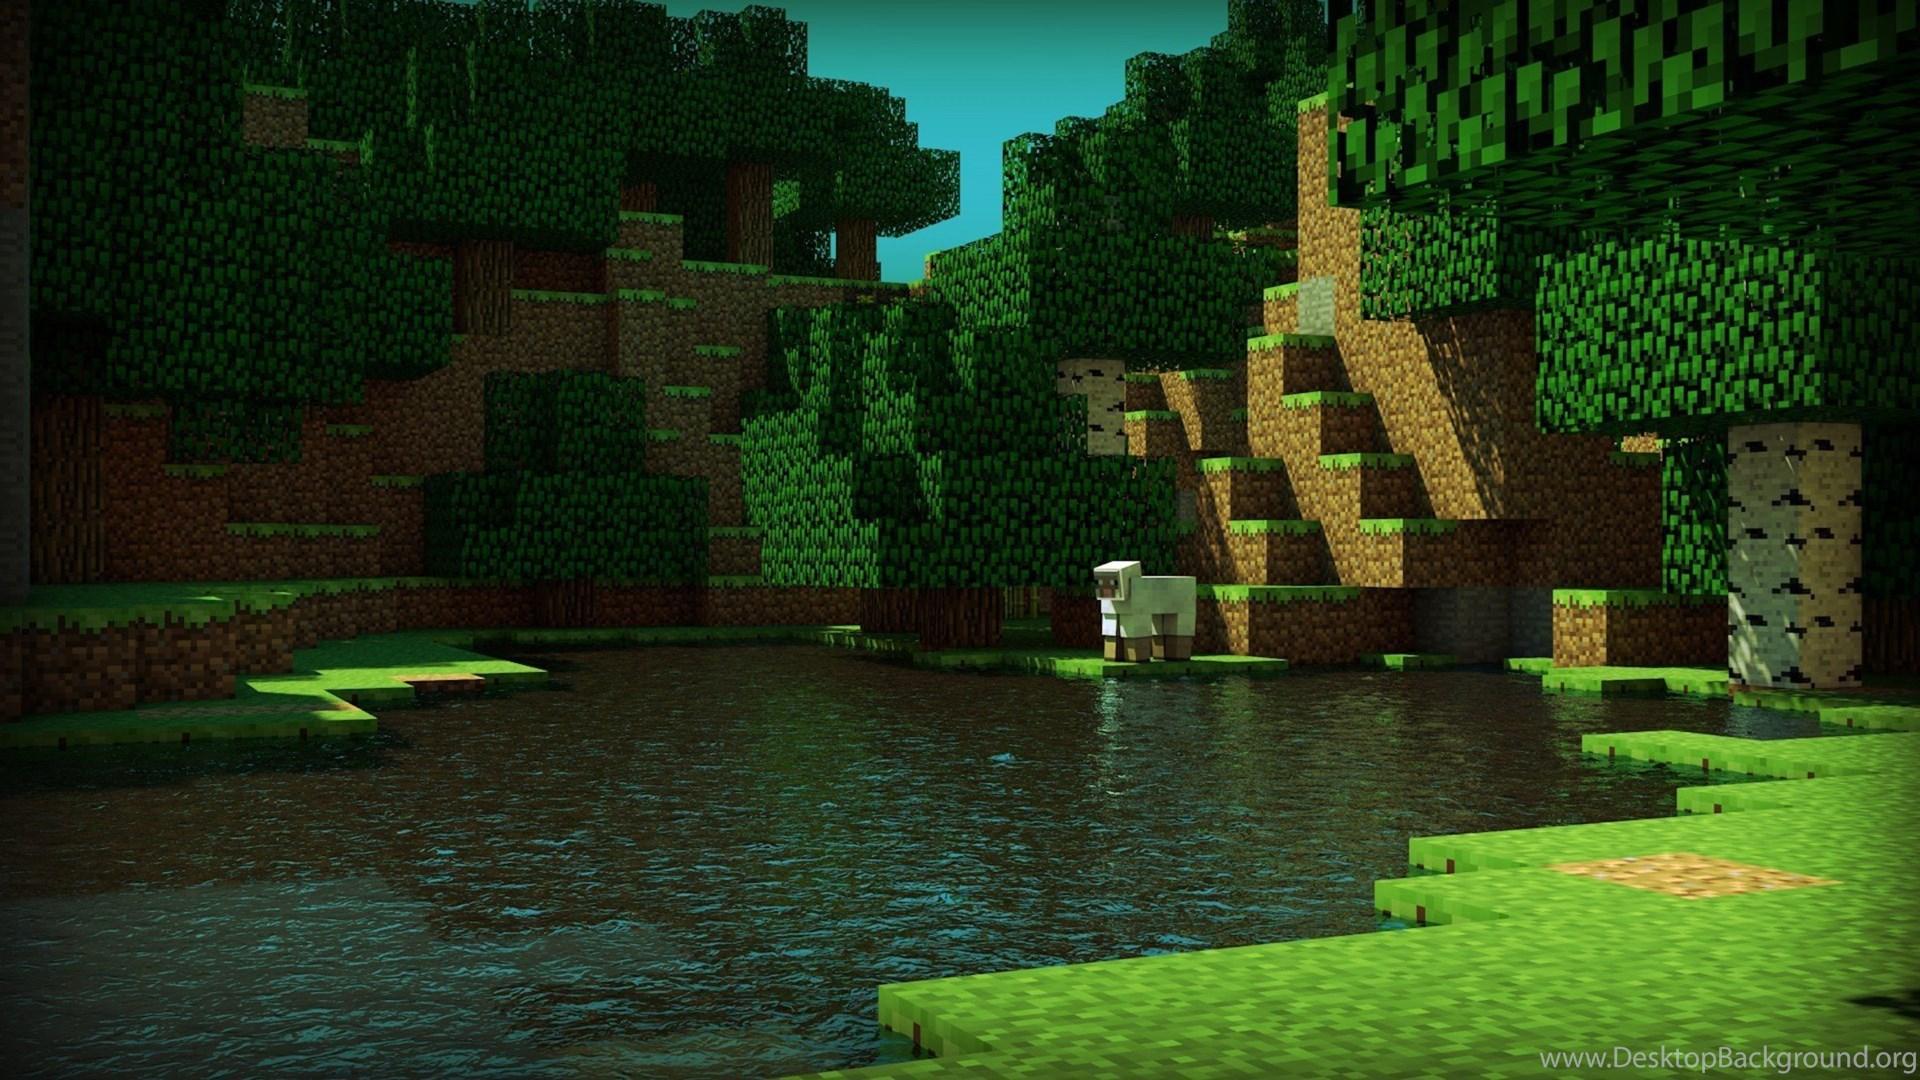 Minecraft Hd Wallpapers Desktop Background